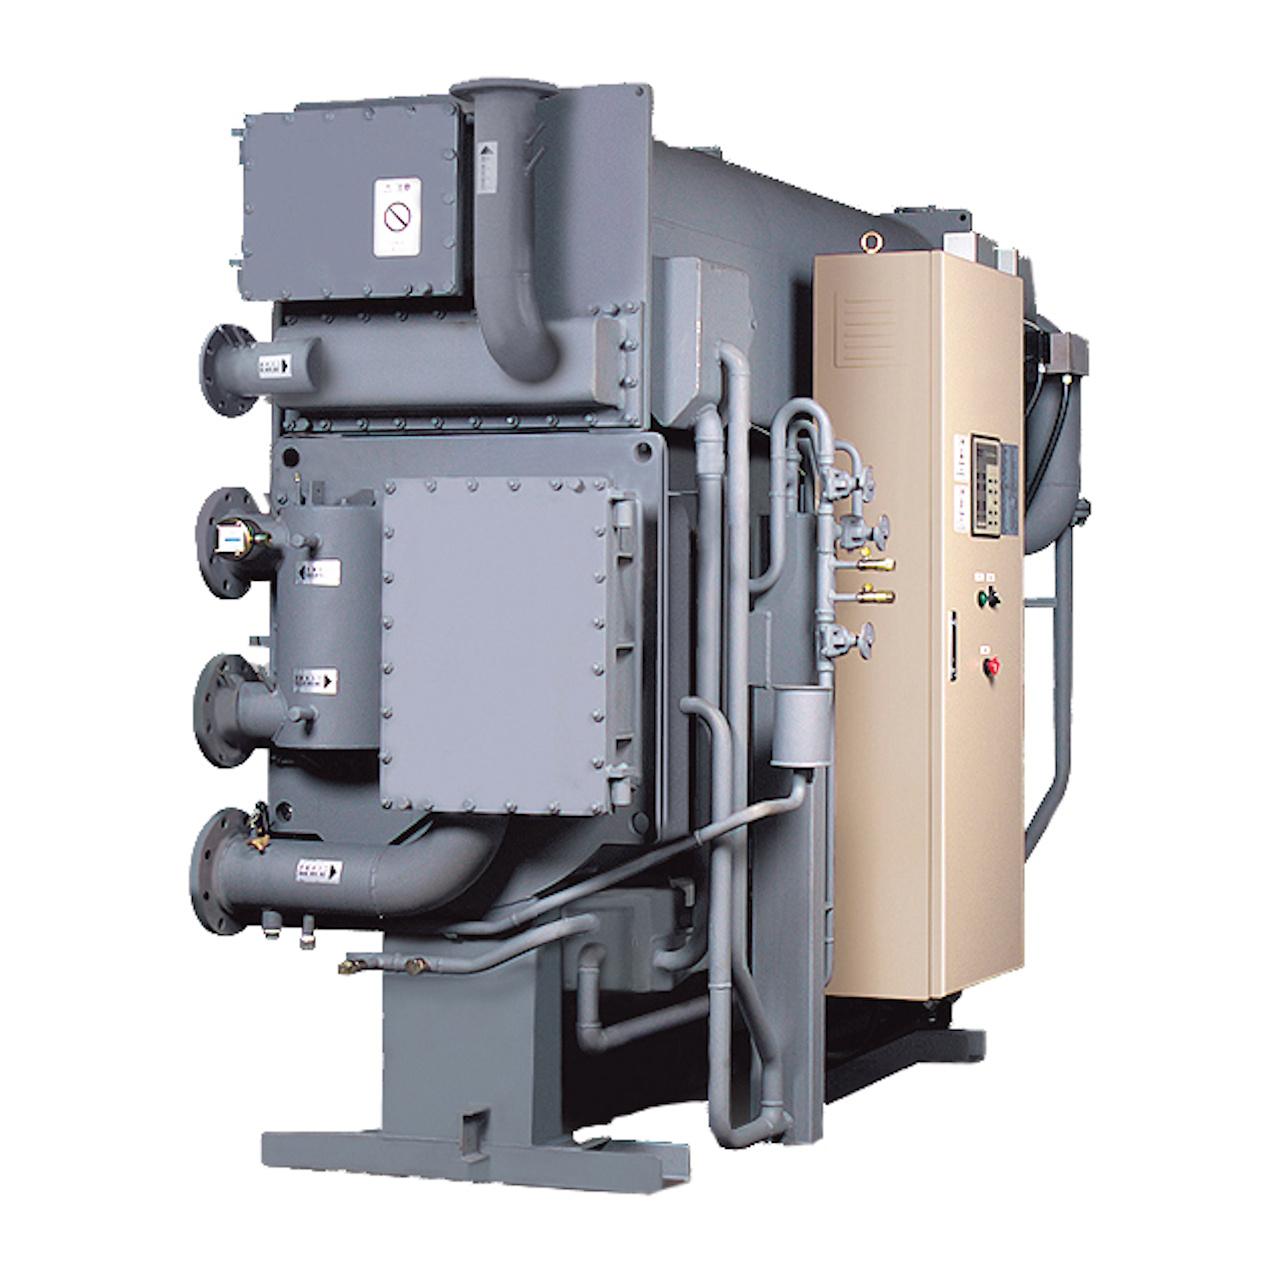 carrier-16LJ-absorption-chiller